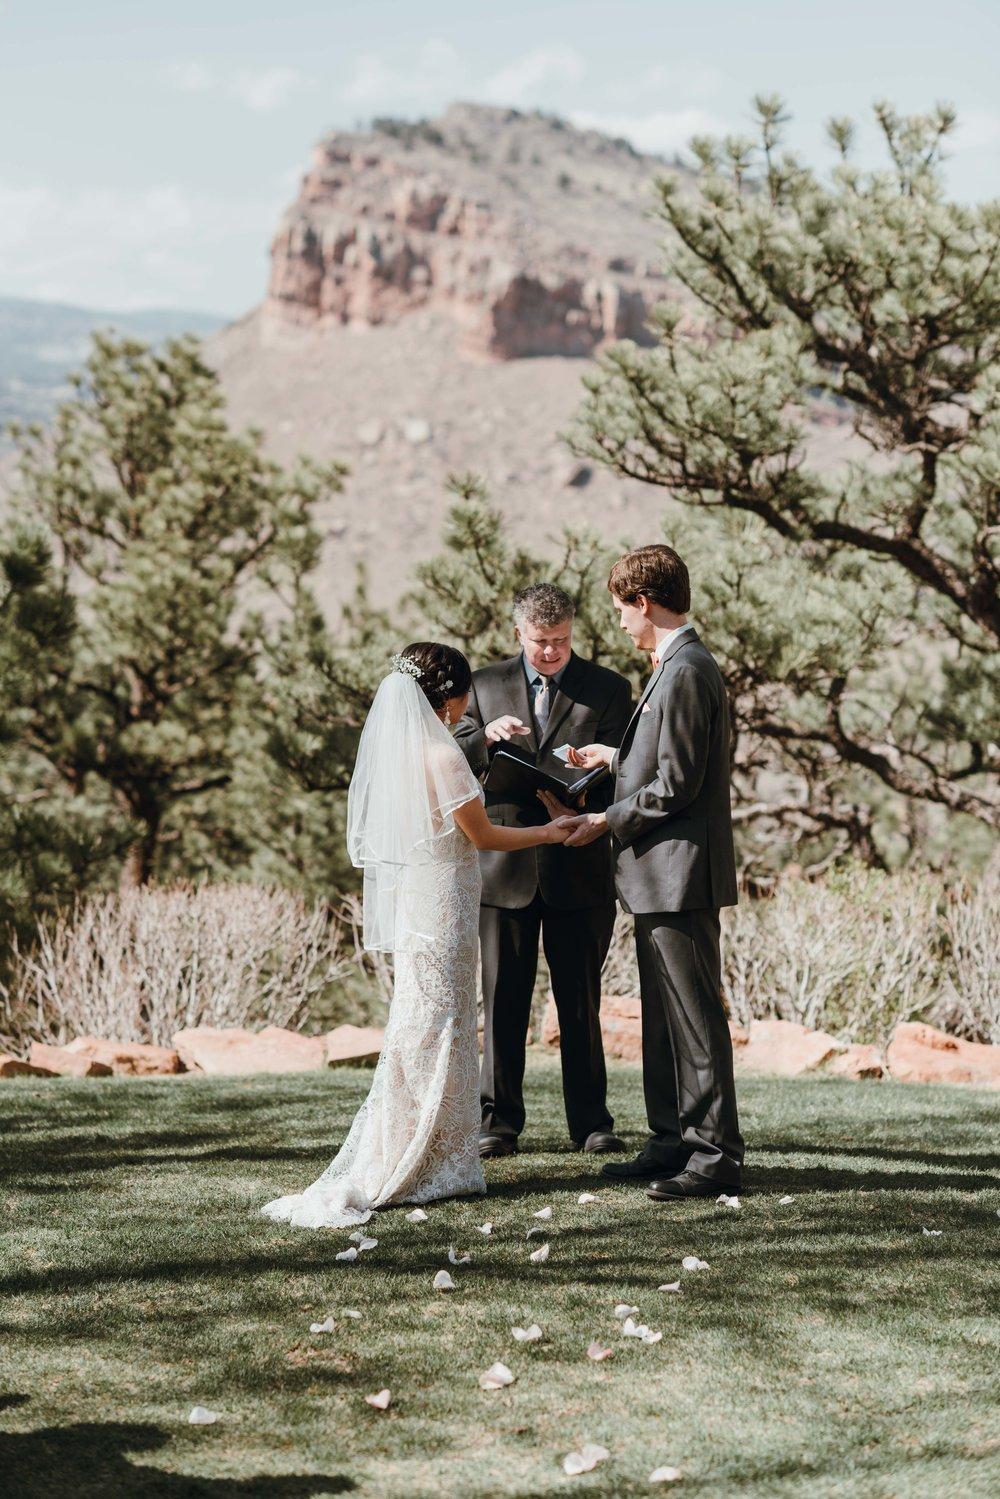 denver wedding photographer lioncrest manor in lyons ben and mali -DSC_1613.jpg